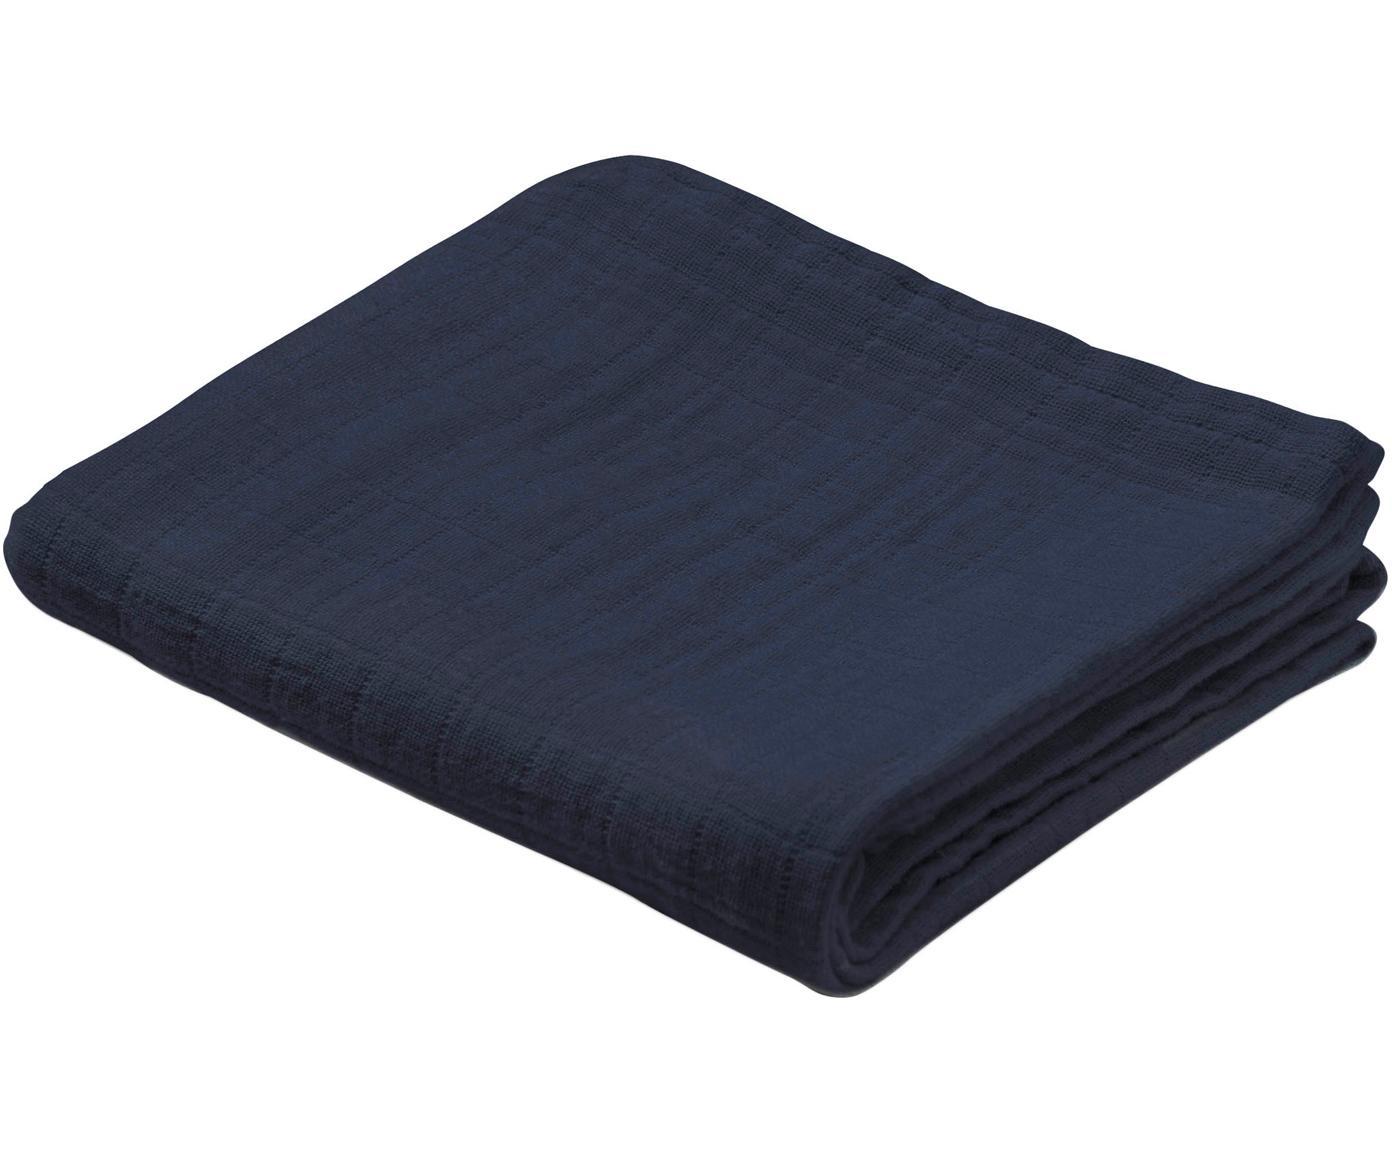 Mulltücher Muslin aus Bio-Baumwolle, 2 Stück, Bio-Baumwolle, GOTS-zertifiziert, Dunkelblau, 70 x 70 cm